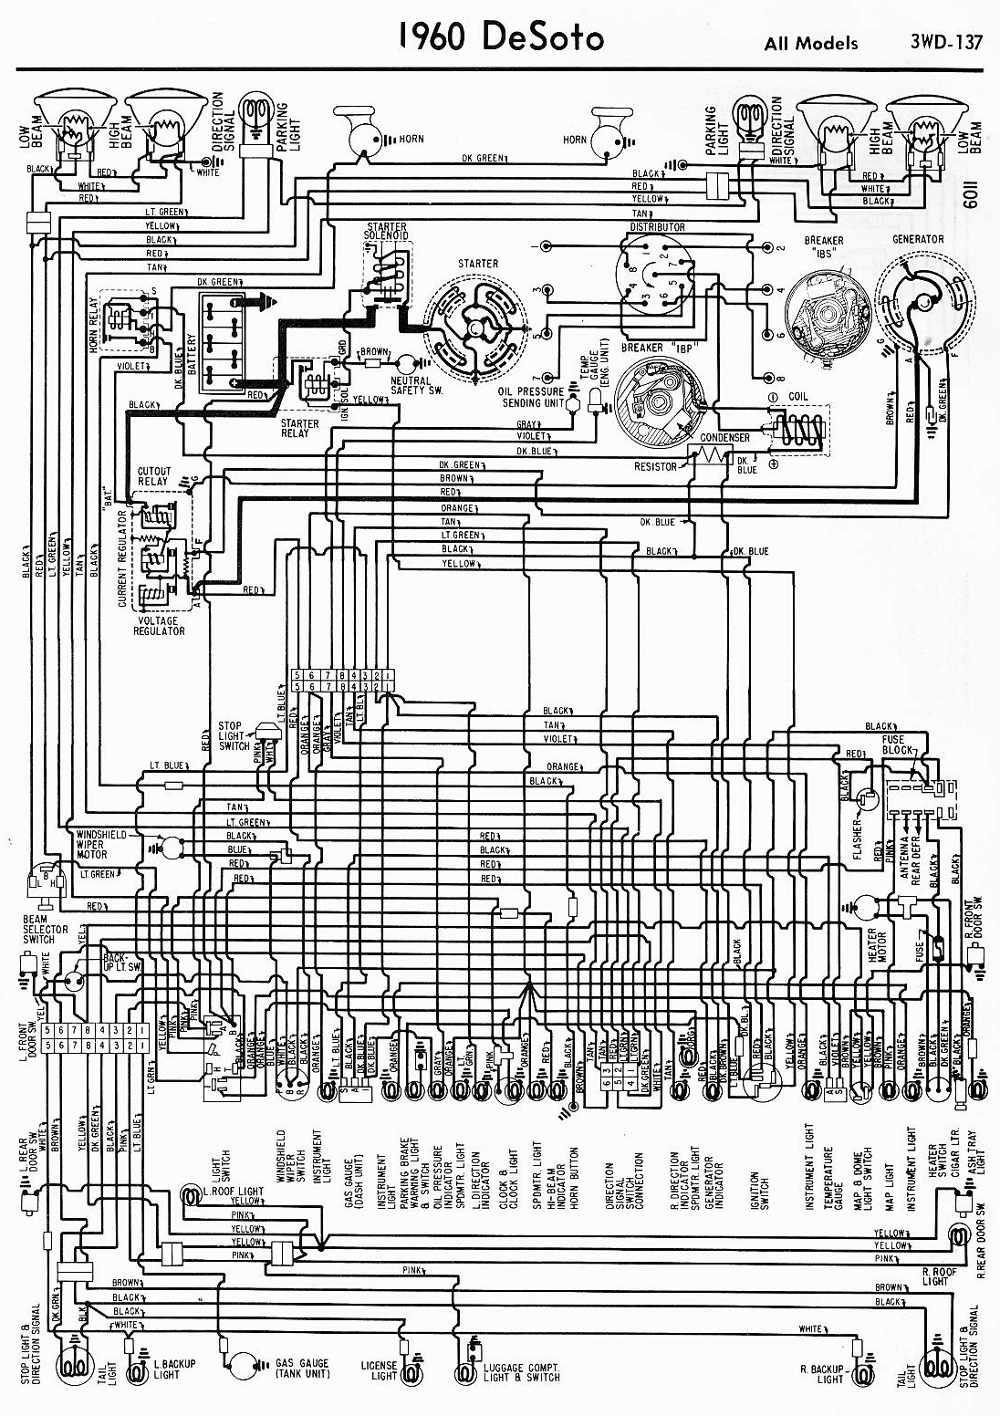 Swell 1946 Desoto Wiring Diagram Wiring Diagram Wiring 101 Photwellnesstrialsorg